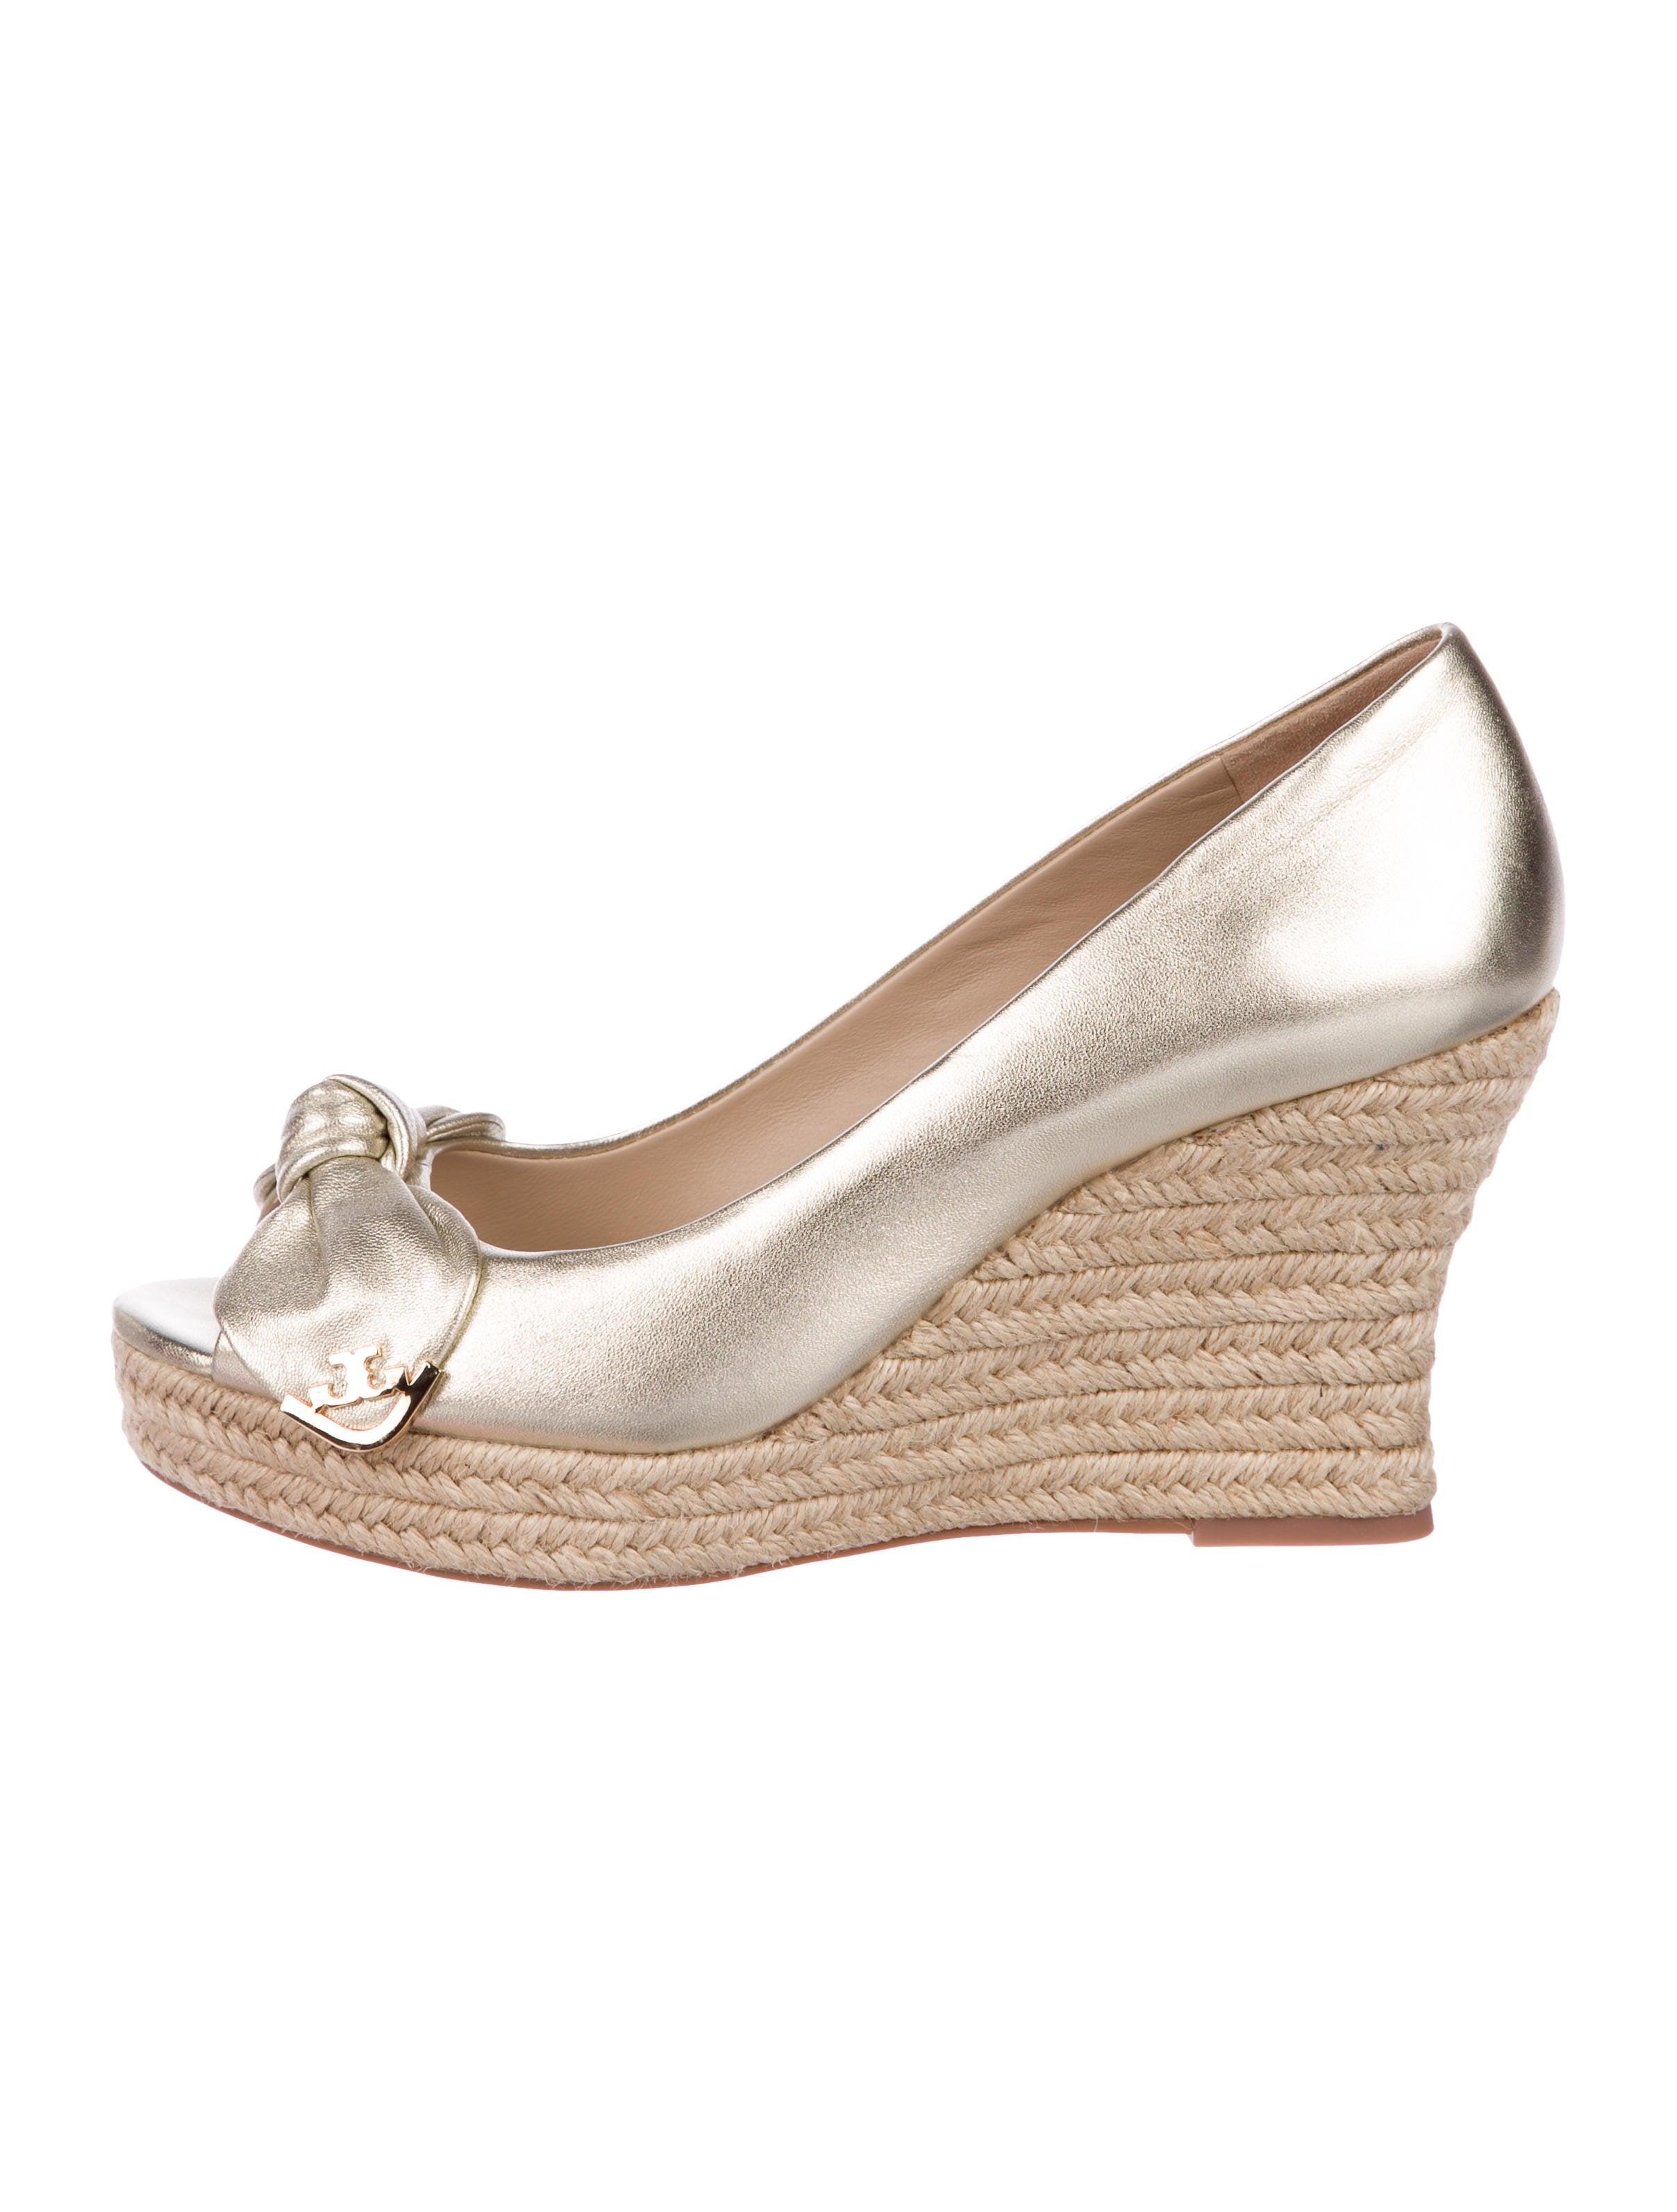 9e392ca3bf18 Tory Burch Dory Metallic Wedges - Shoes - WTO165256